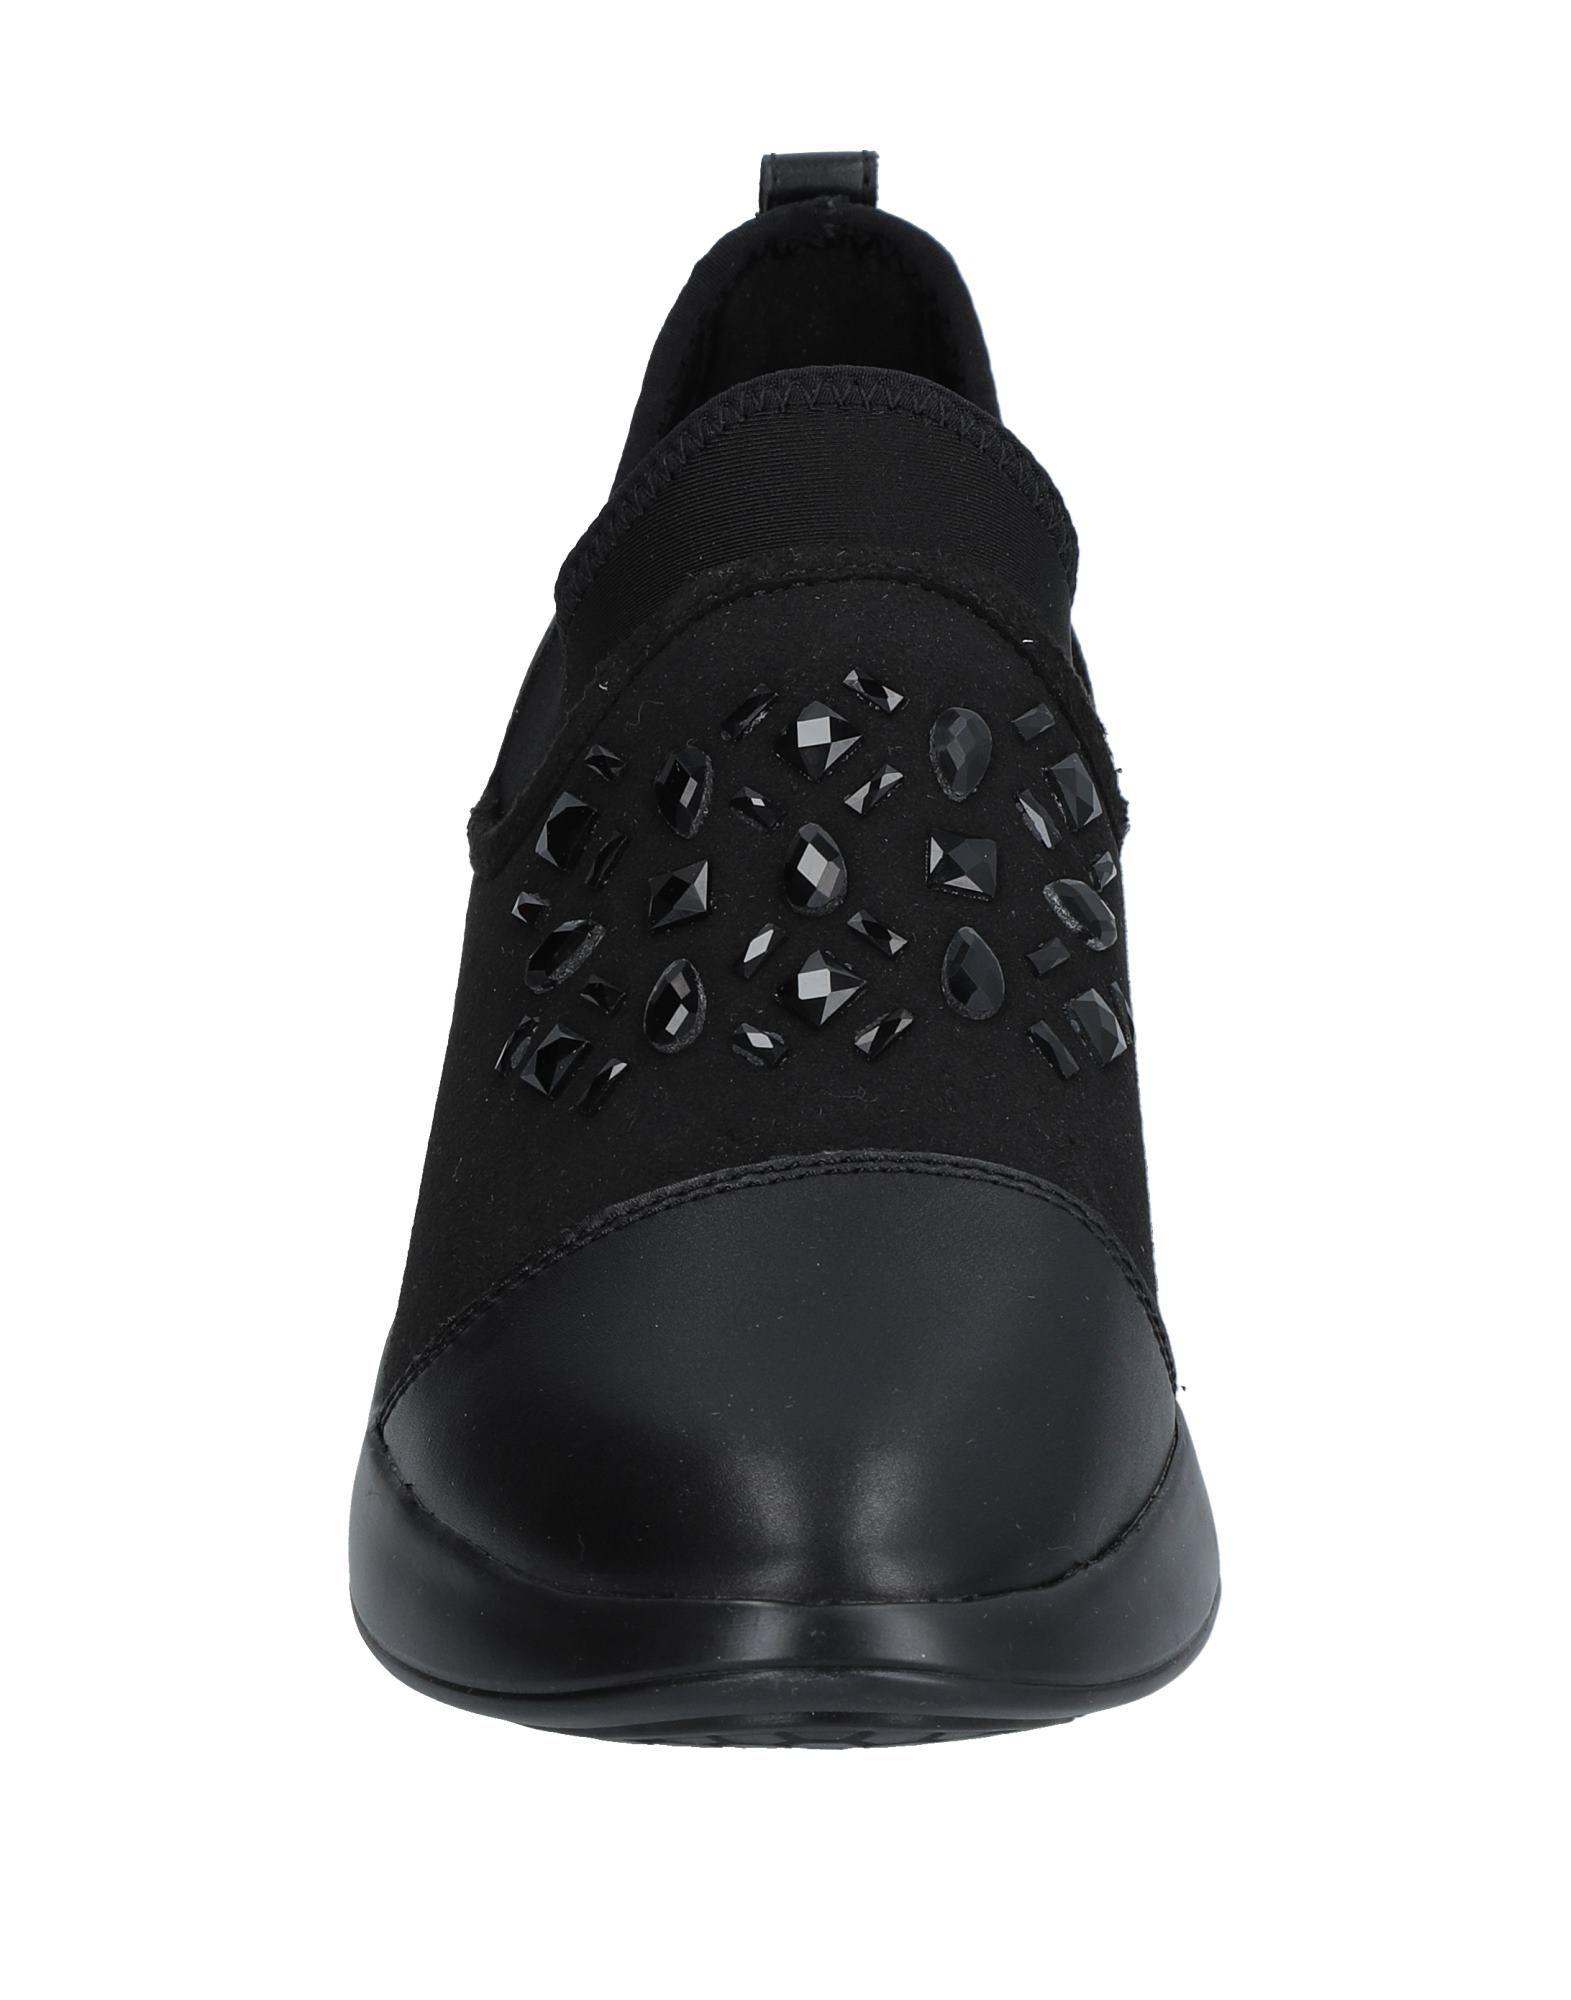 Moda Sneakers Sneakers Moda Geox Donna - 11541908VK f02102